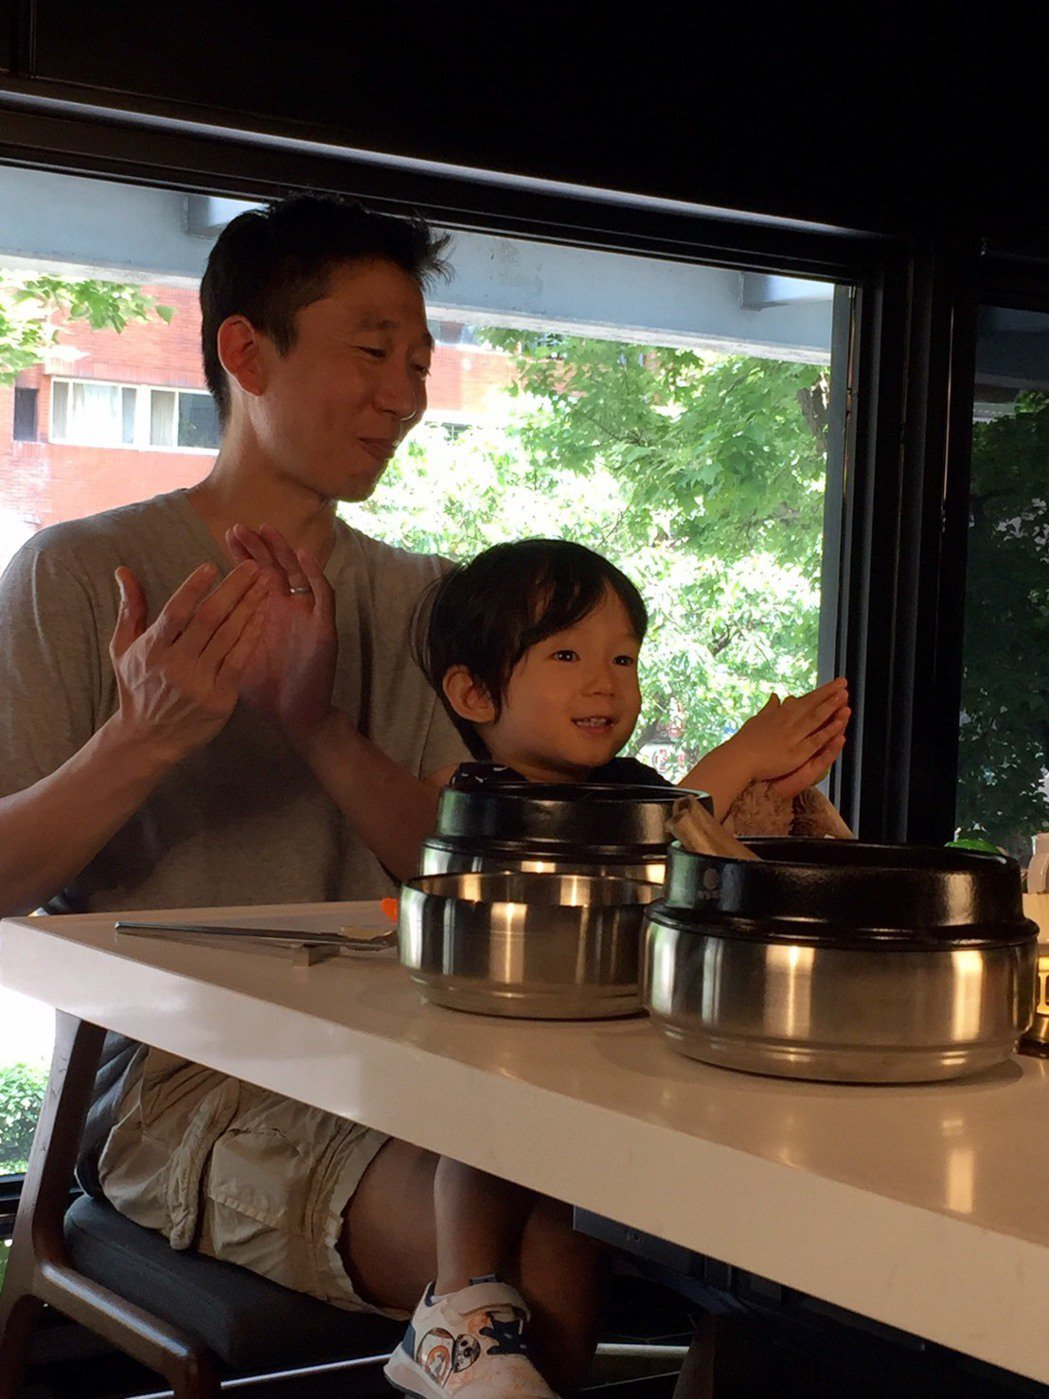 Max(右)與Tony用餐畫面吸睛。圖/Maple Tree House提供